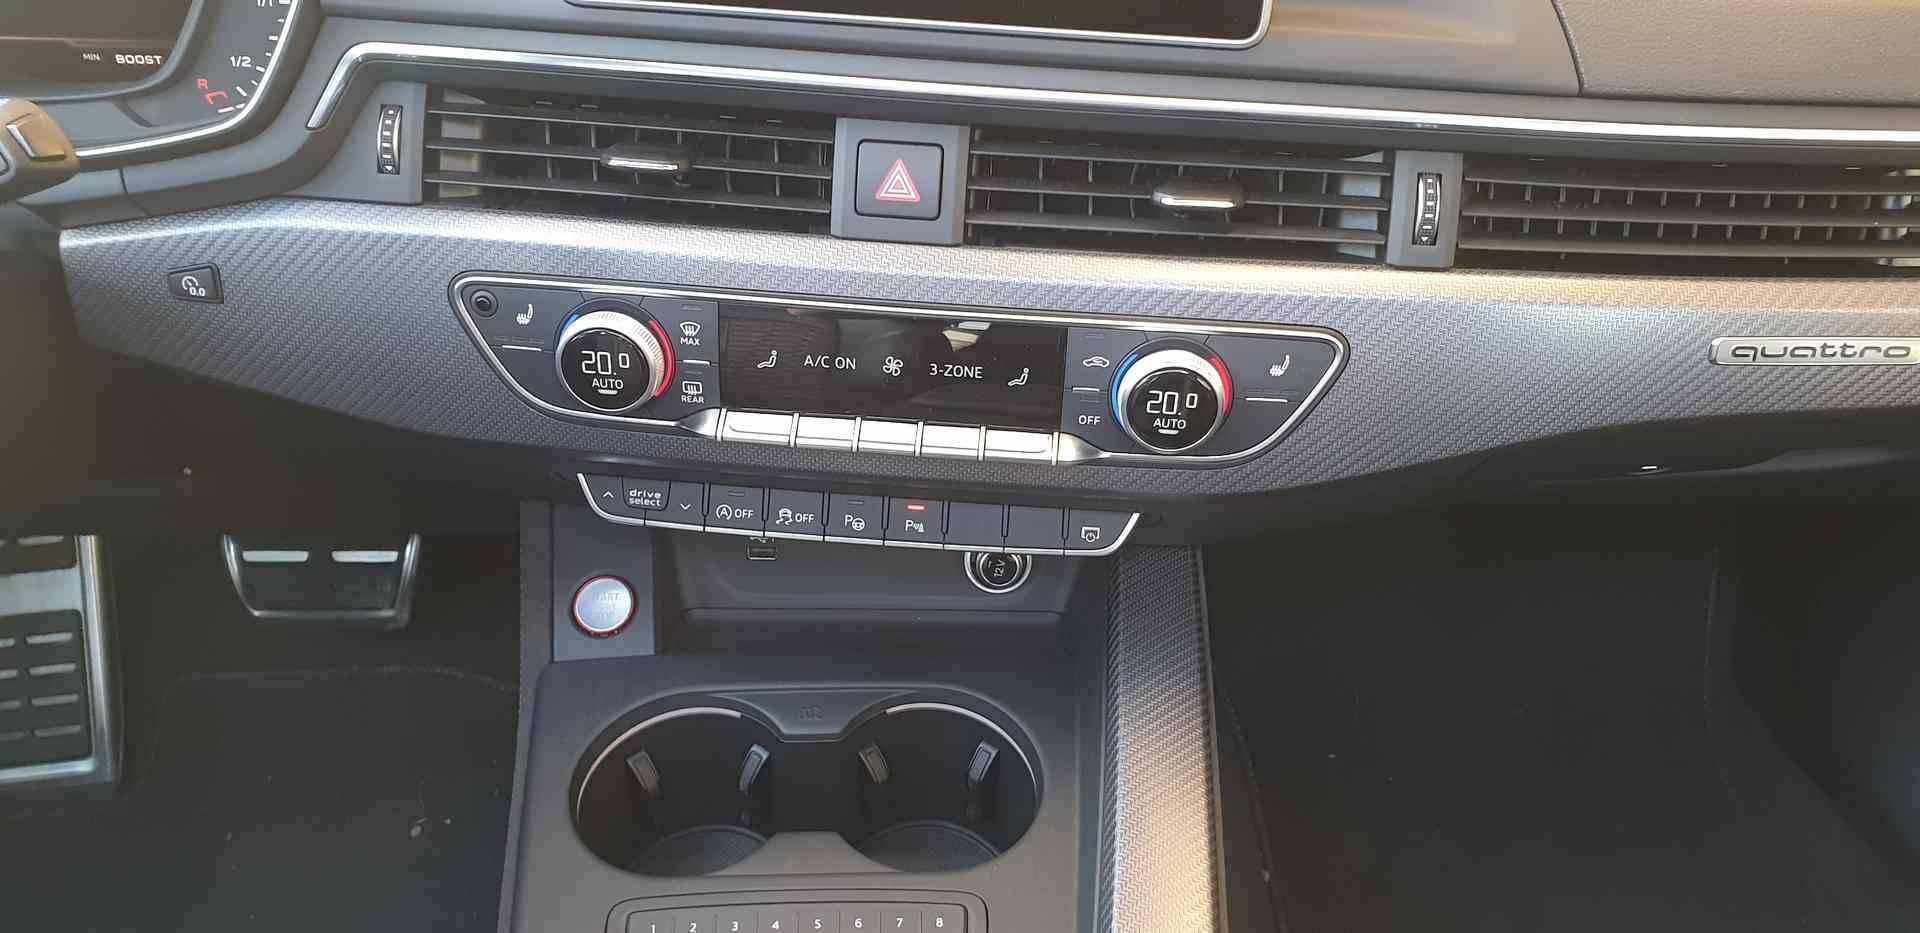 15 - RS4 Avant V6 2.9 TFSI 450 ch Tiptronic 8